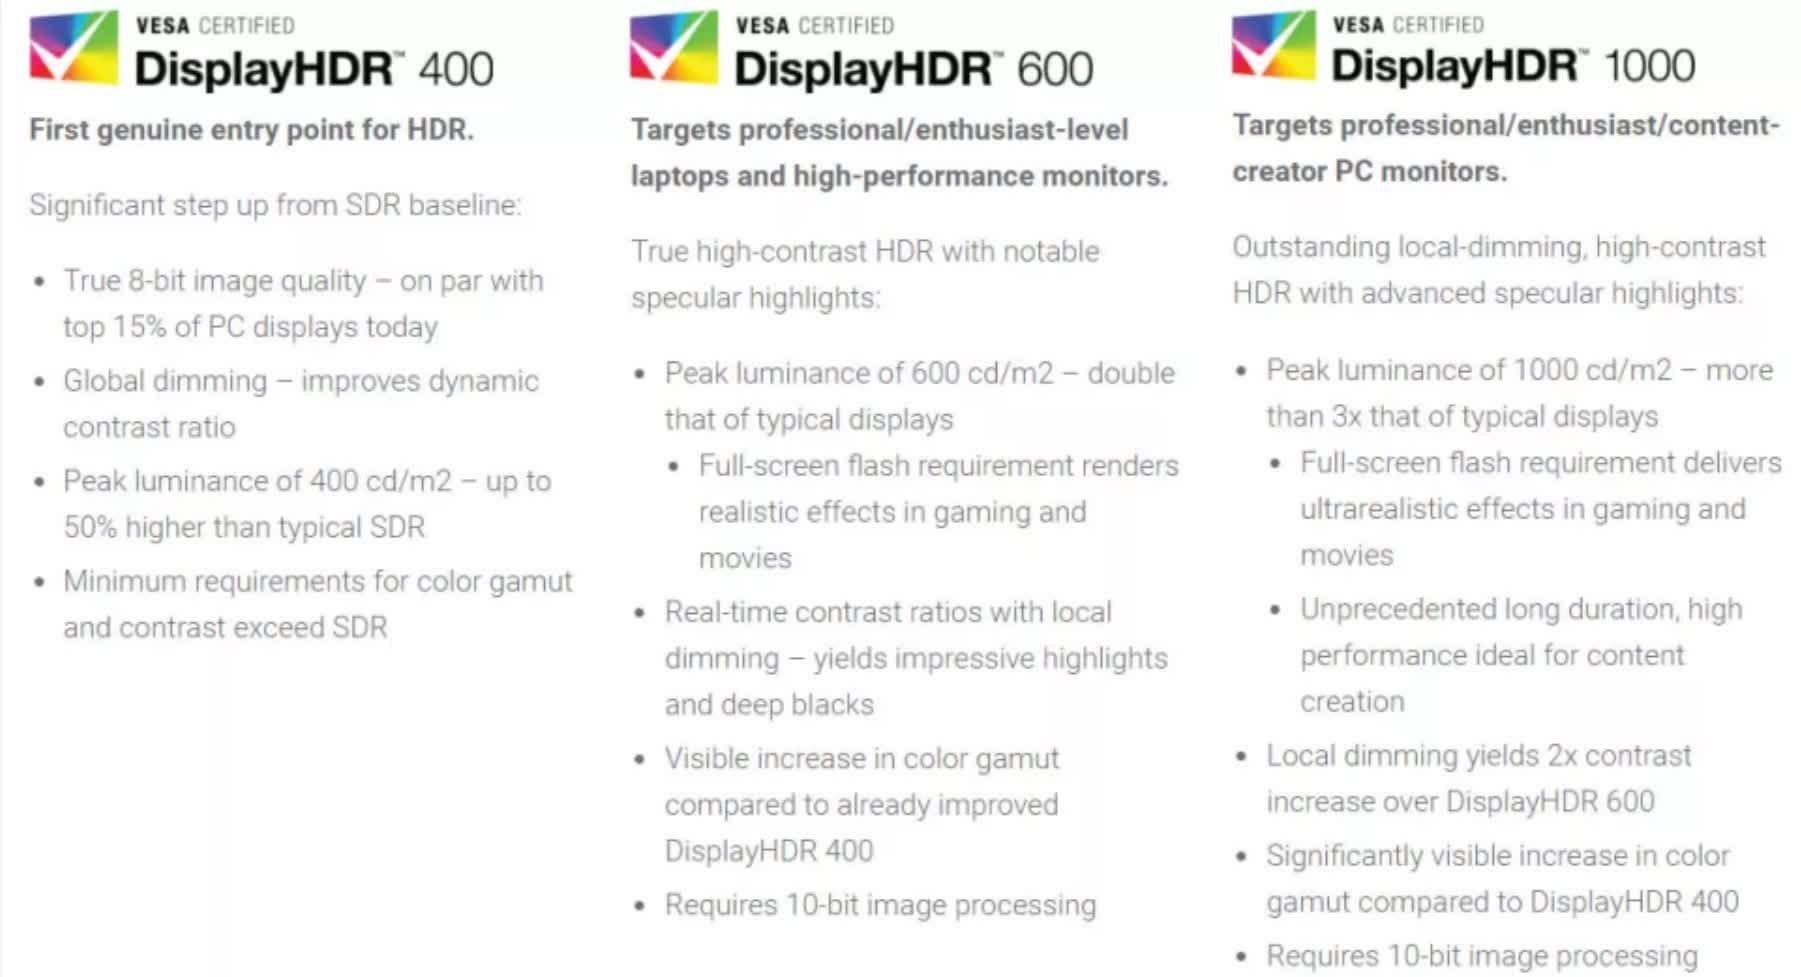 VESA dit que les moniteurs DisplayHDR 2000 nexistent pas